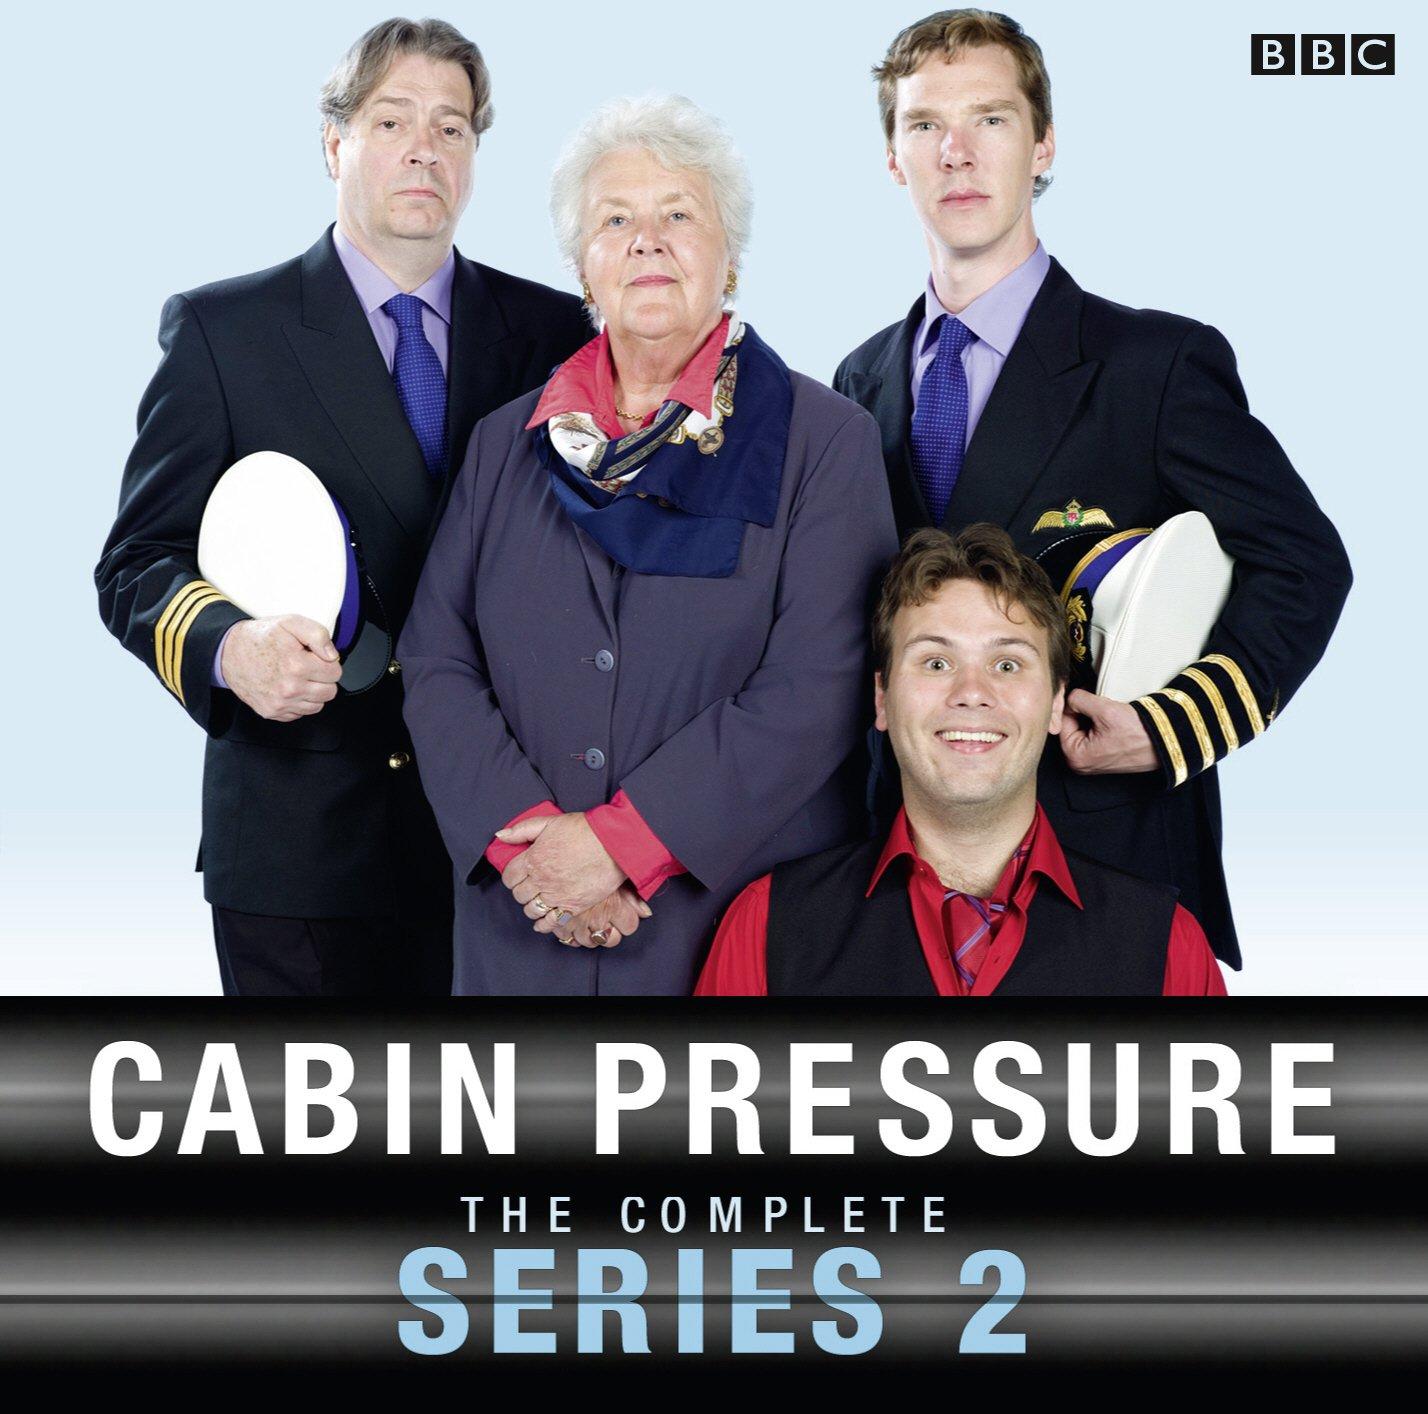 Cabin Pressure: The Complete Series 2: Amazon.co.uk: John Finnemore,  Benedict Cumberbatch, Full Cast, Roger Allam, Stephanie Cole: Books